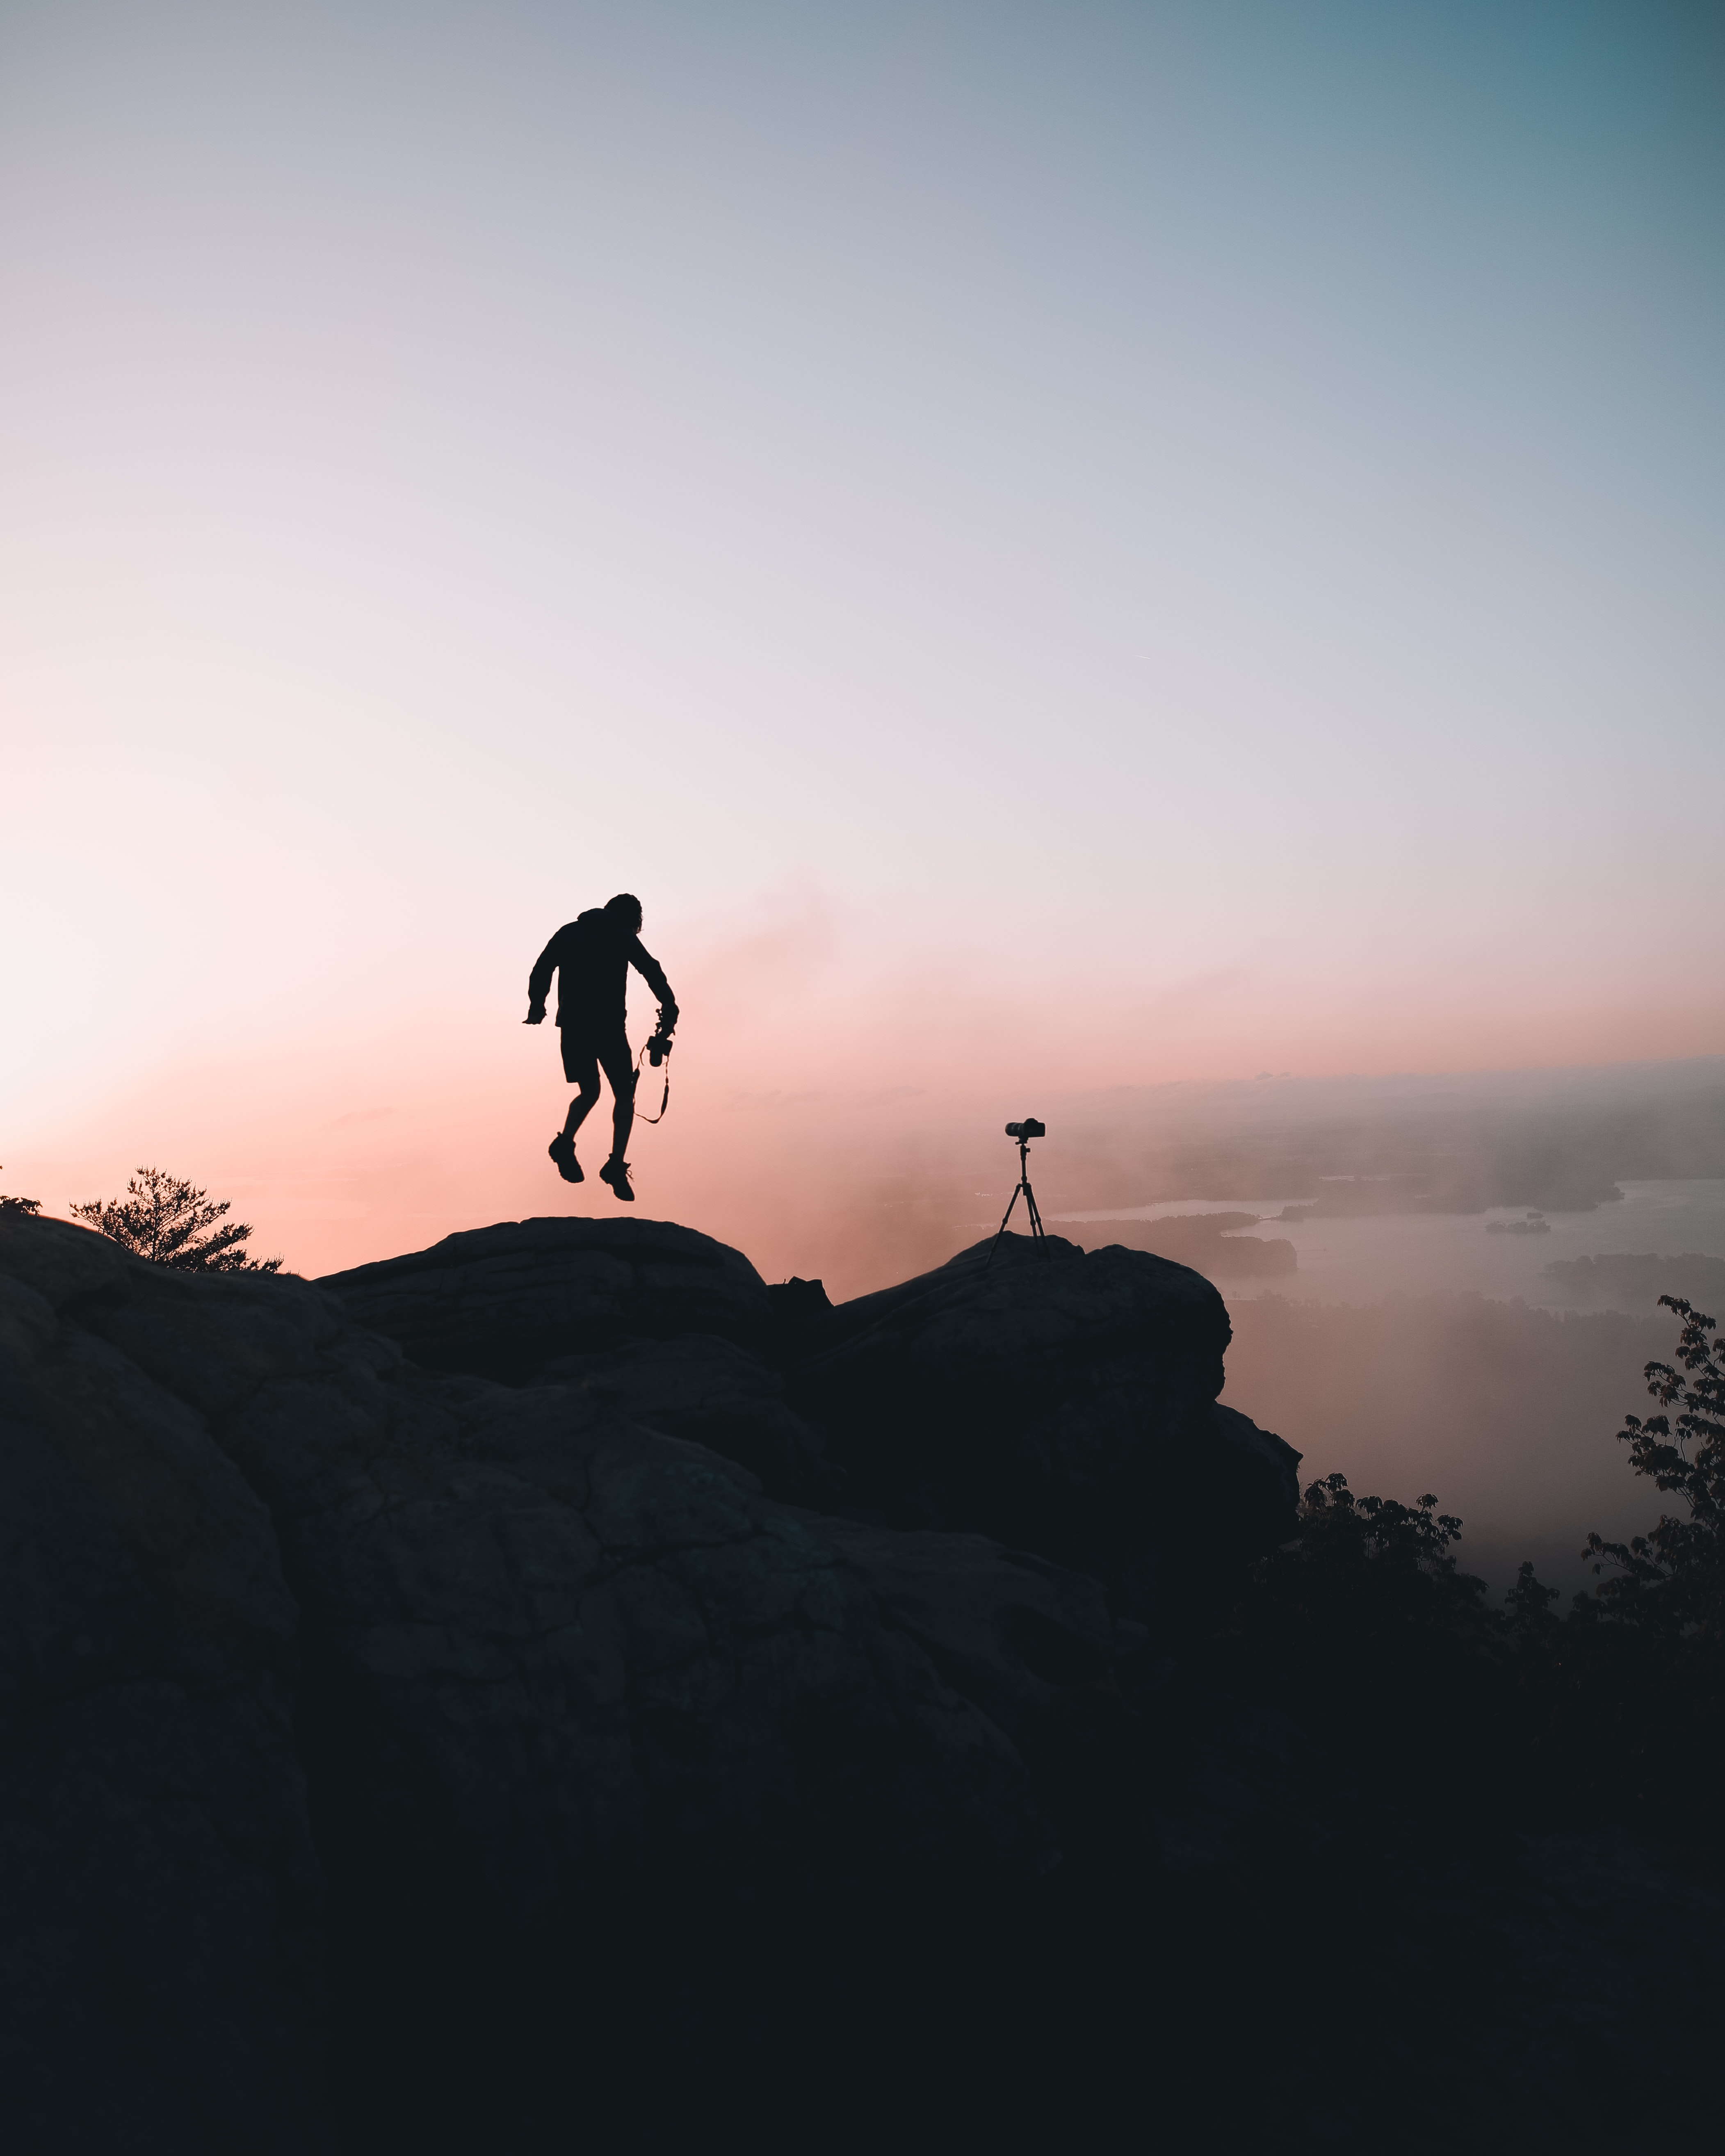 man jumping near cliff